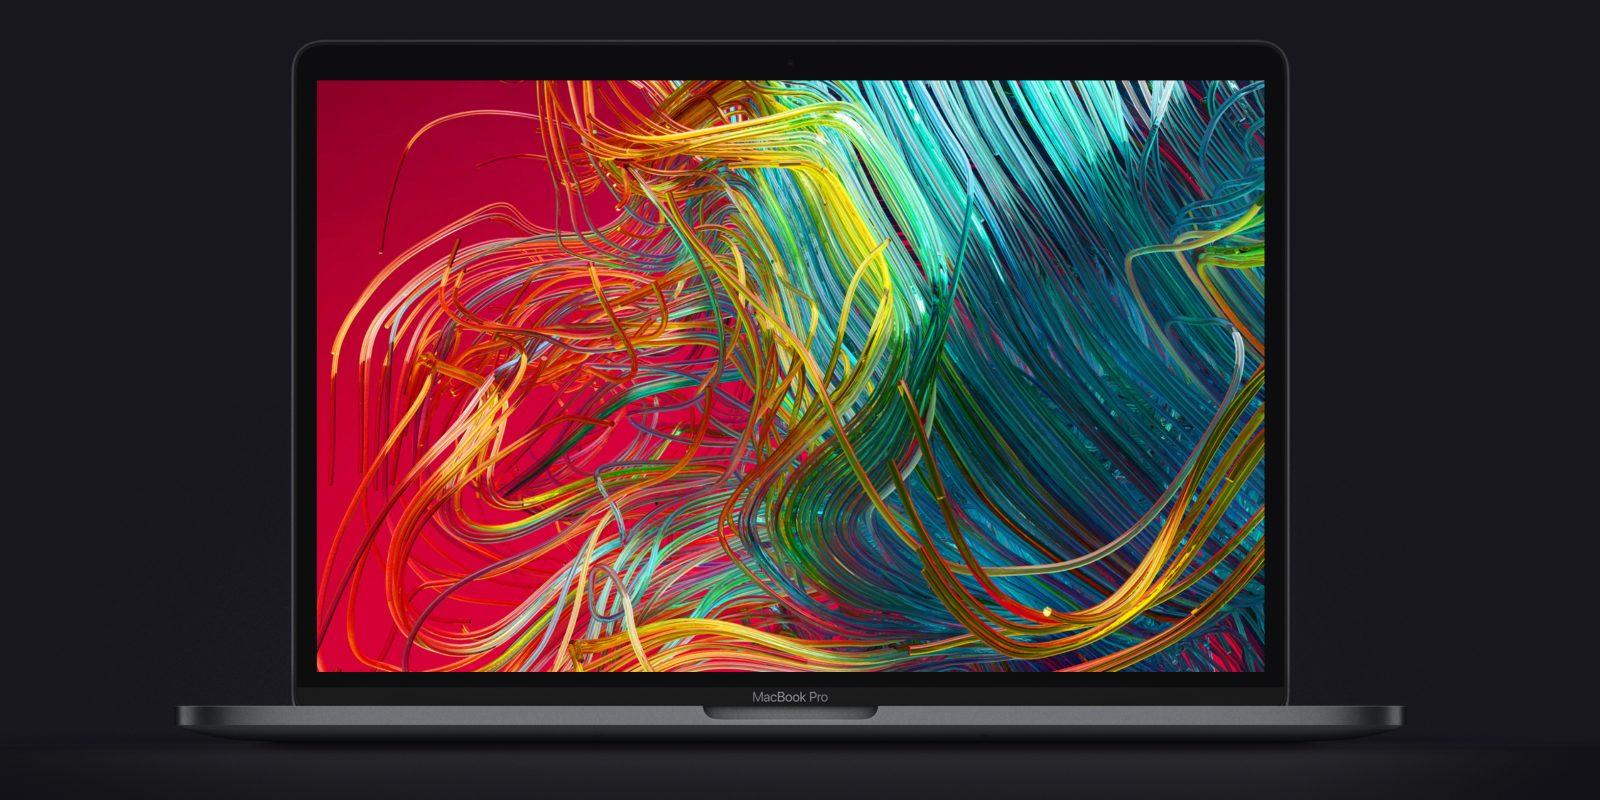 Best Prime Day Mac deals: Save on MacBooks, iMacs, Mac mini, and more